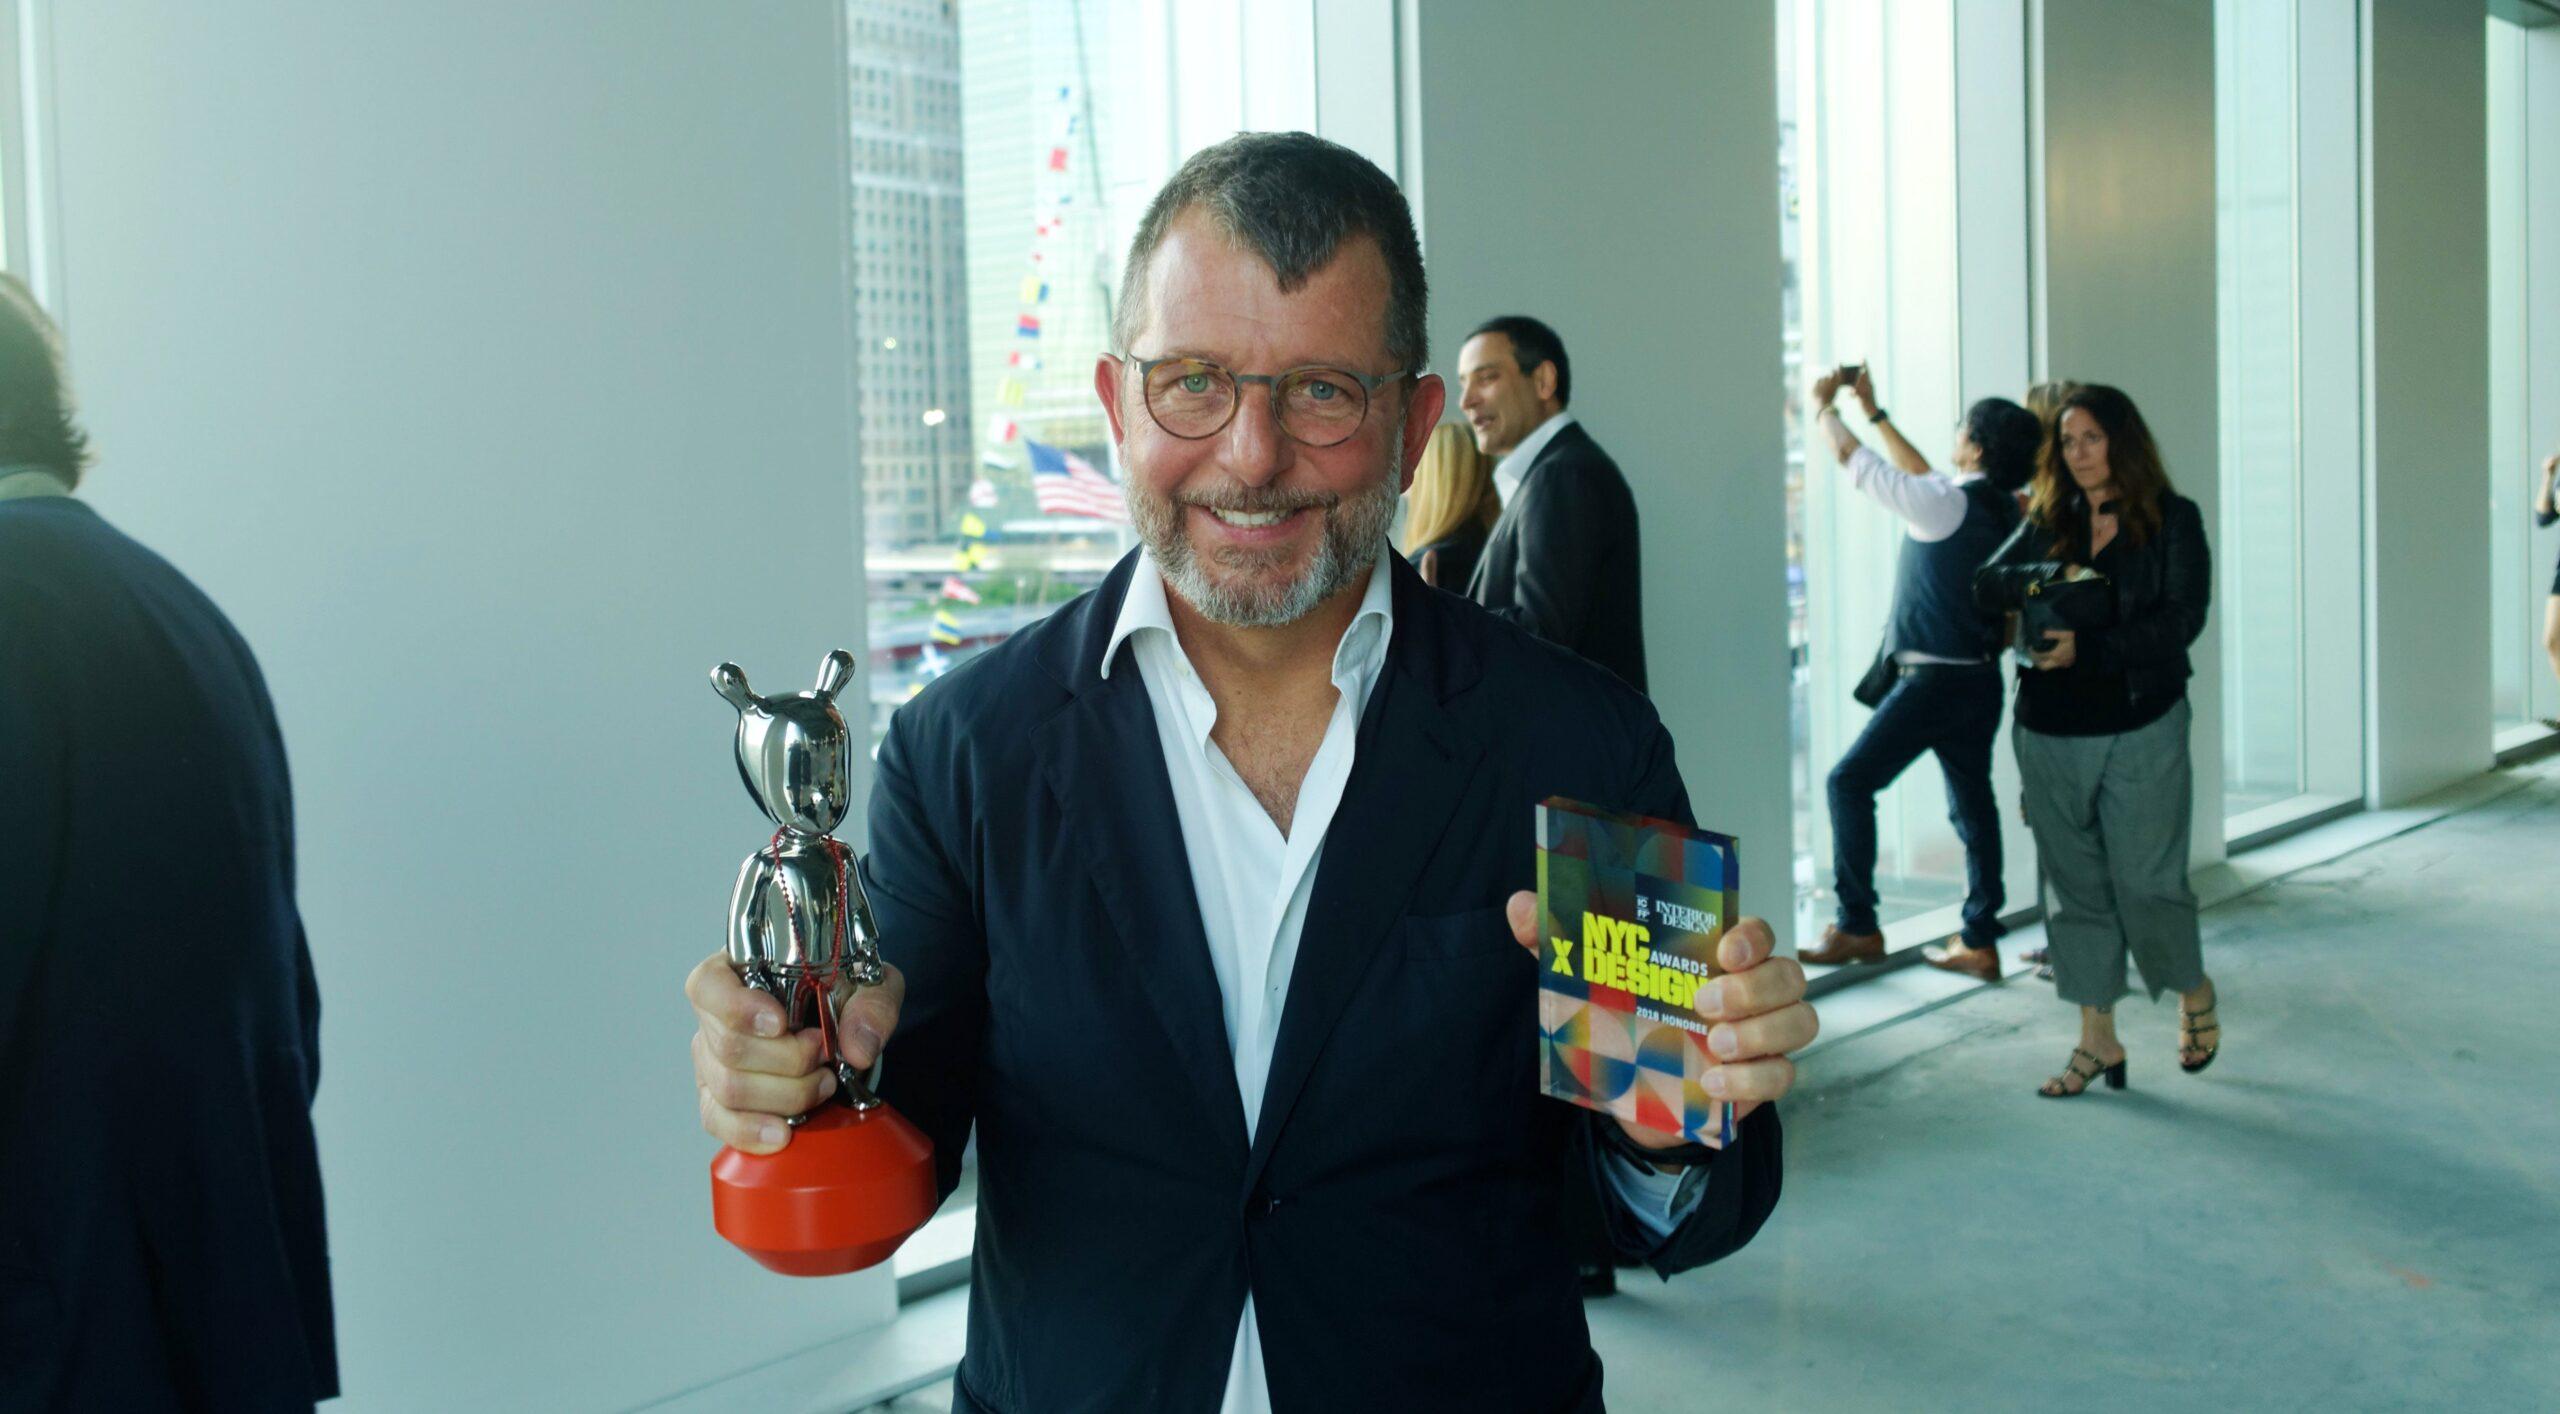 Image of Daniel Germani 1 1 4 scaled in DeKauri by Daniel Germani Wins 2018 NYCxDESIGN Award - Cosentino